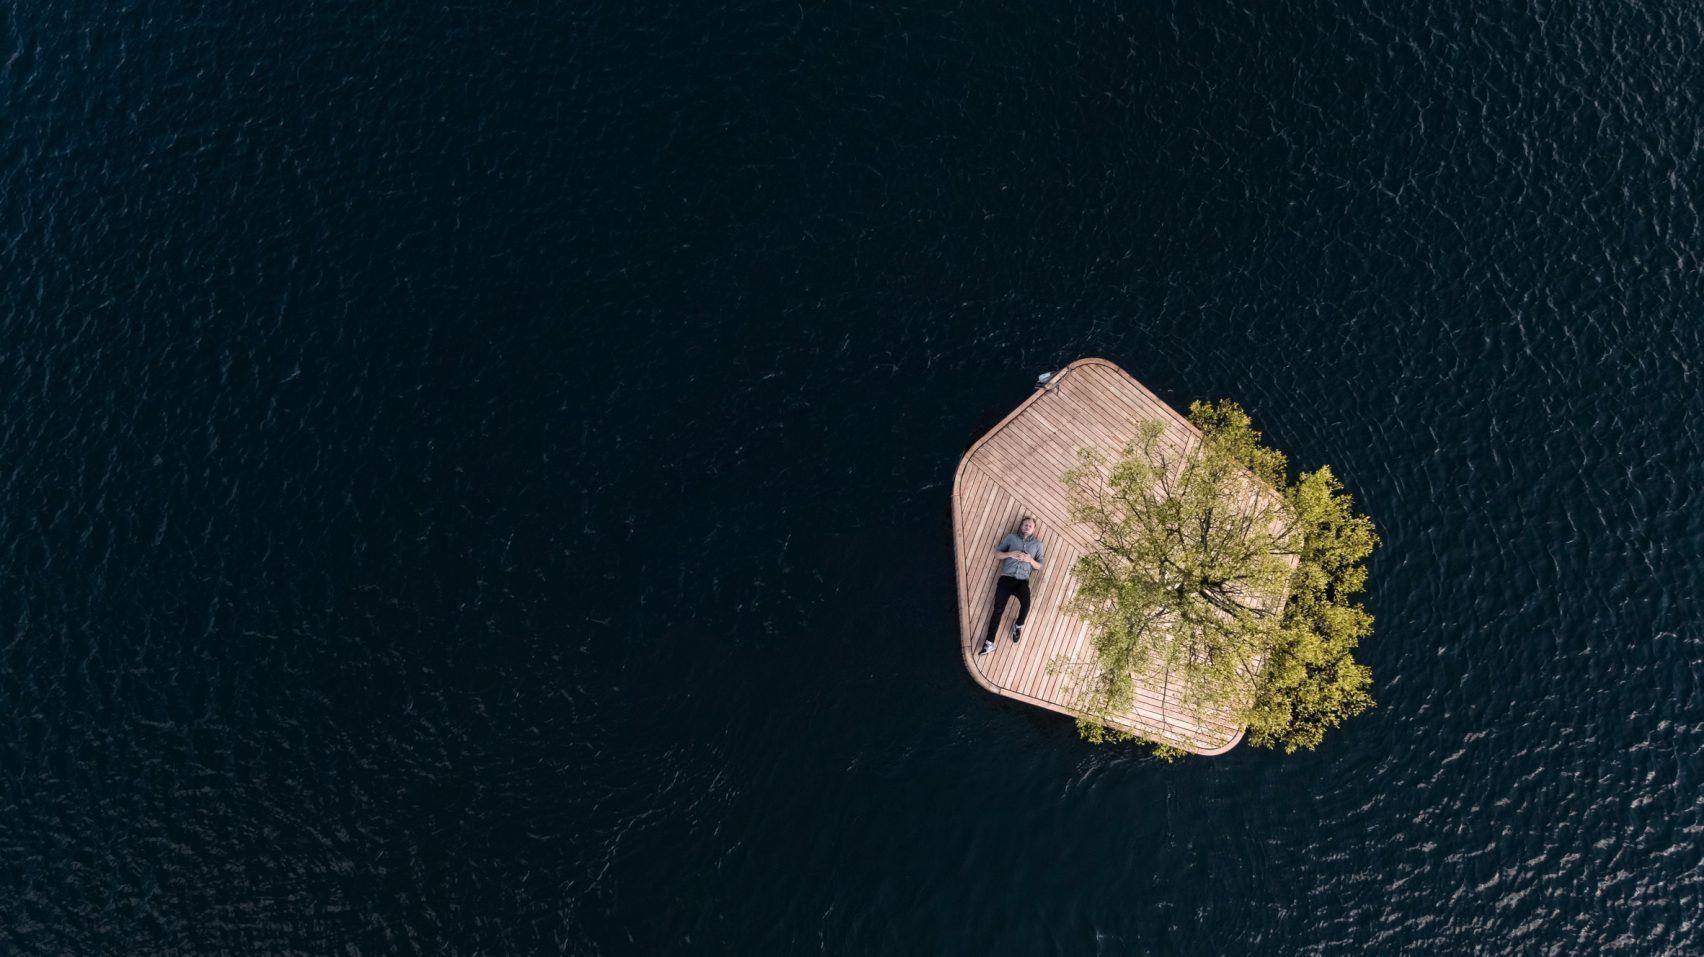 Marshall Blecher And Magnus Maarbjerg Copenhagen Floating Island Artificial Island Floating Architecture Copenhagen